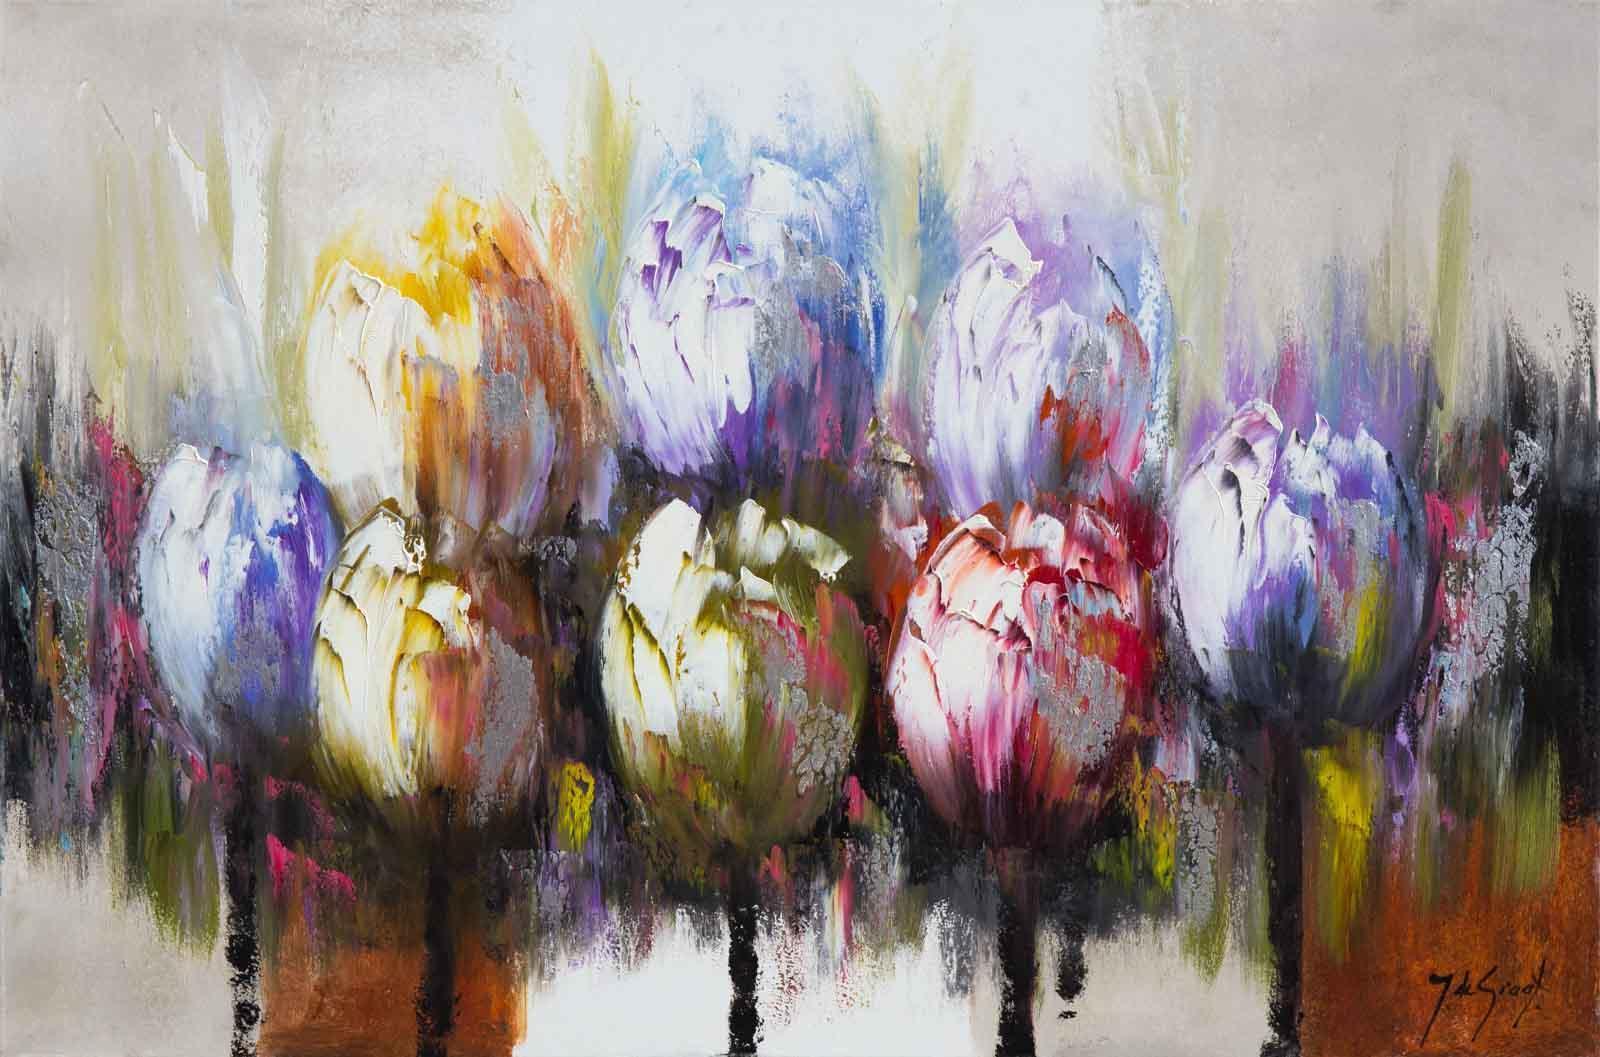 Spring Fever, Jochem De Graaf